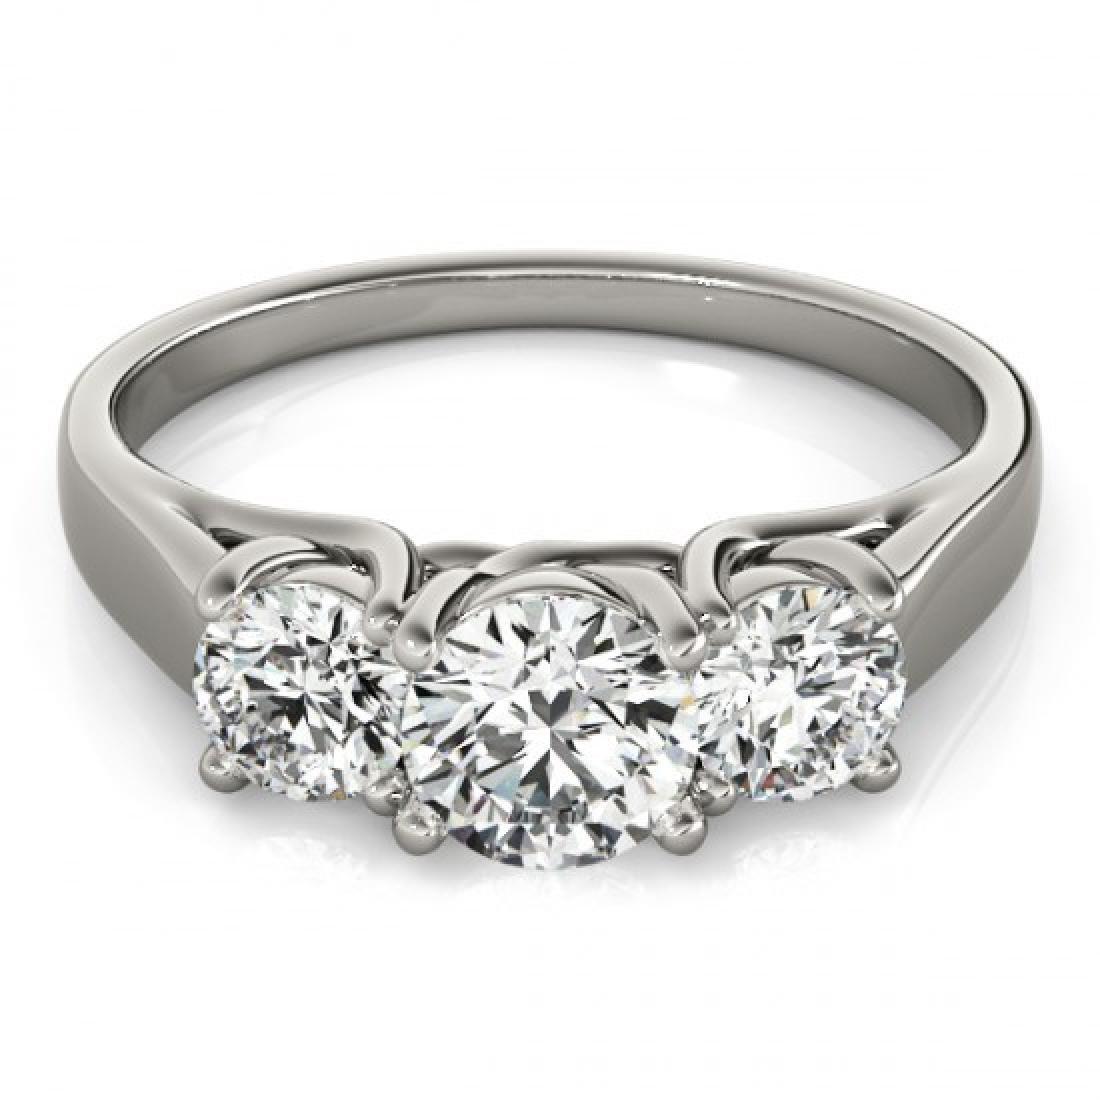 1.3 CTW Certified VS/SI Diamond 3 Stone Ring 14K White